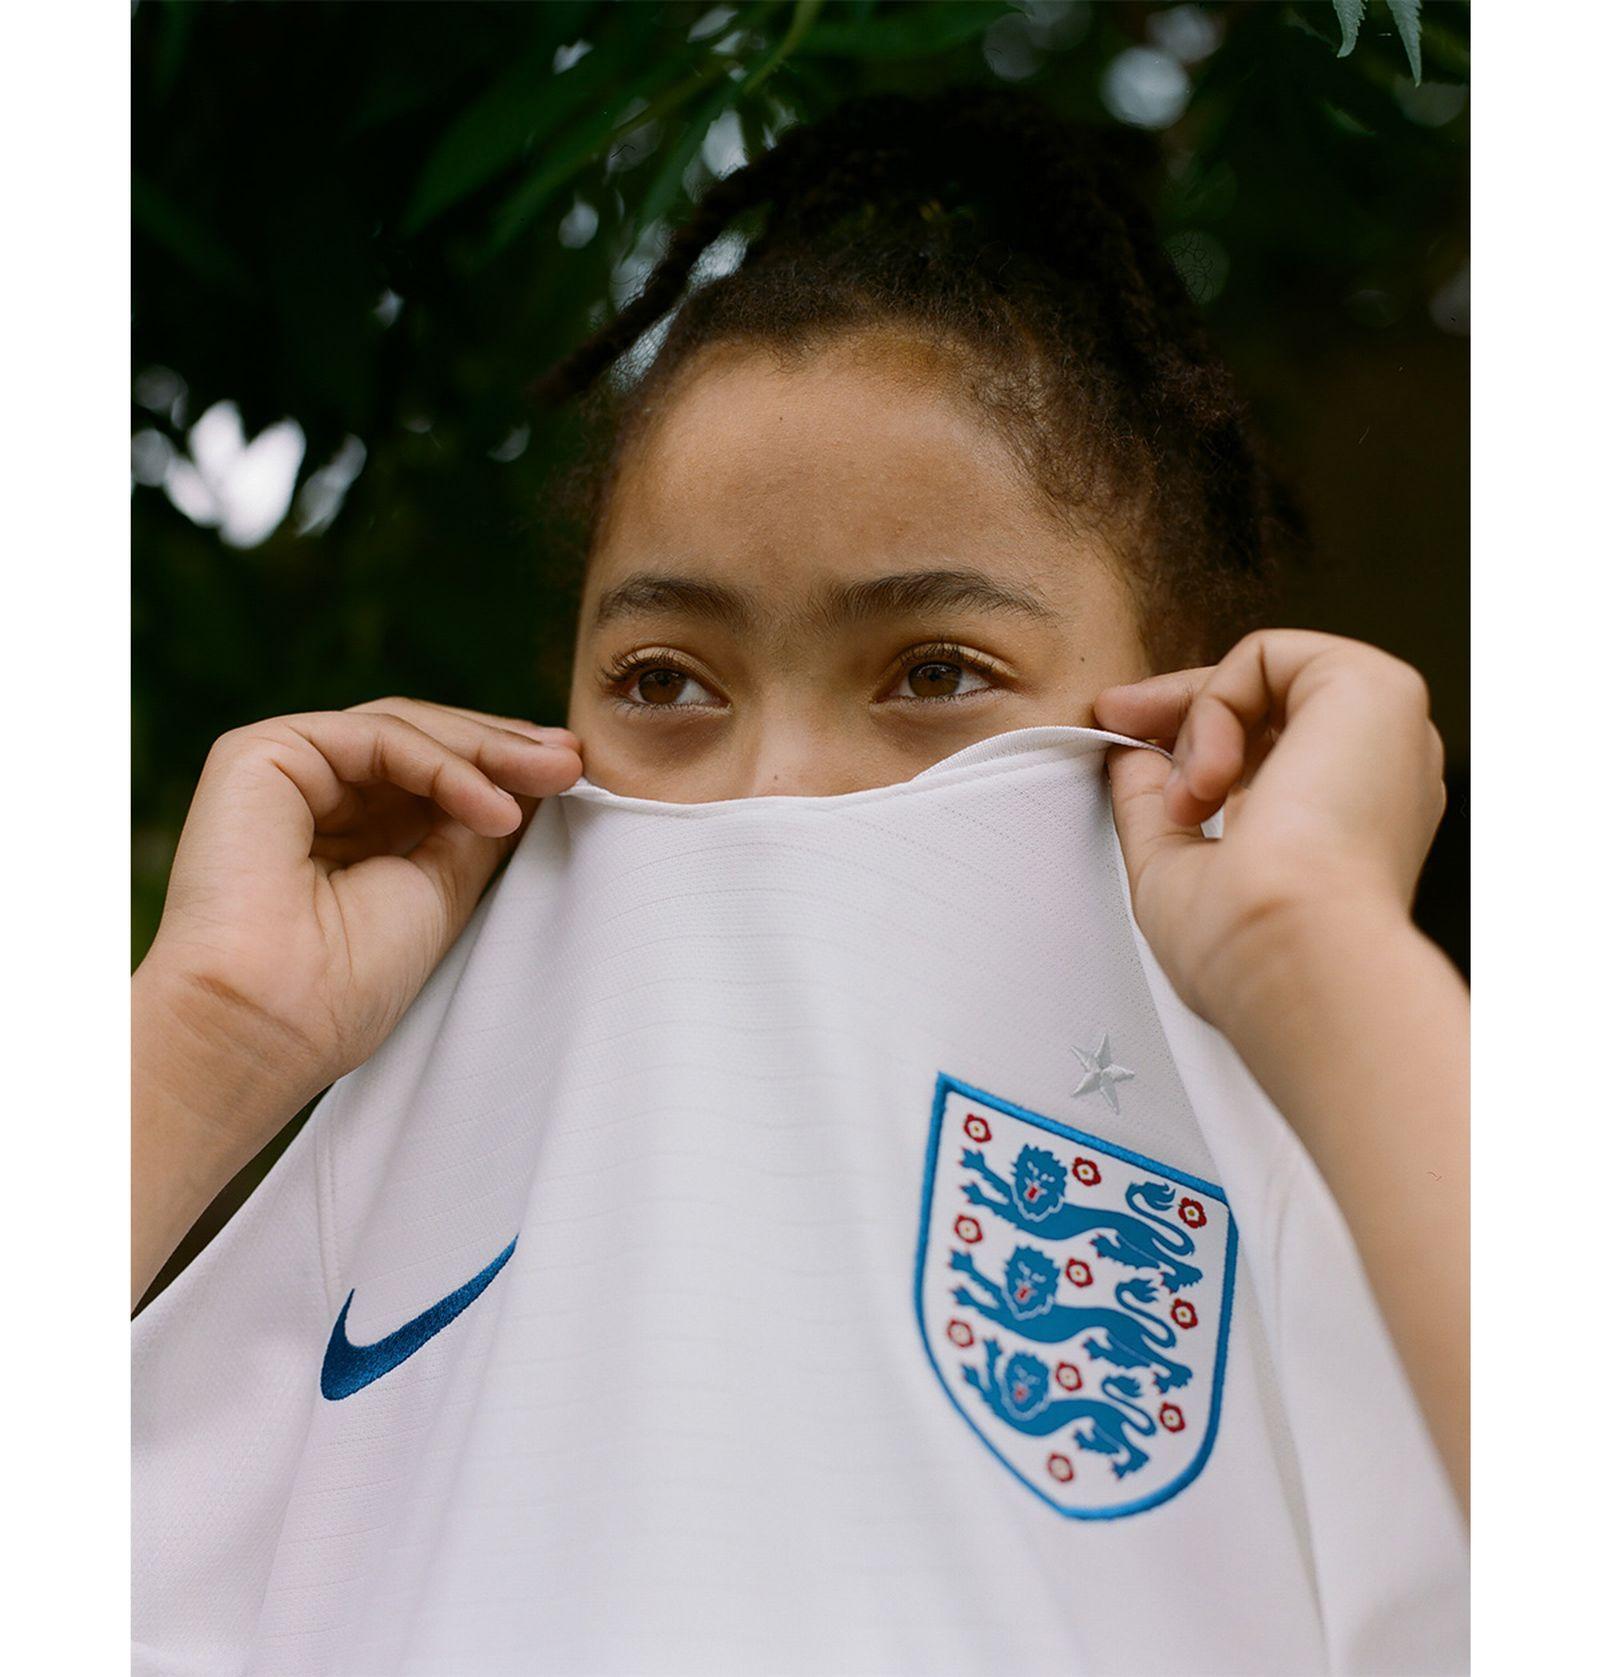 nike football world cup jerseys 2018 FIFA World Cup